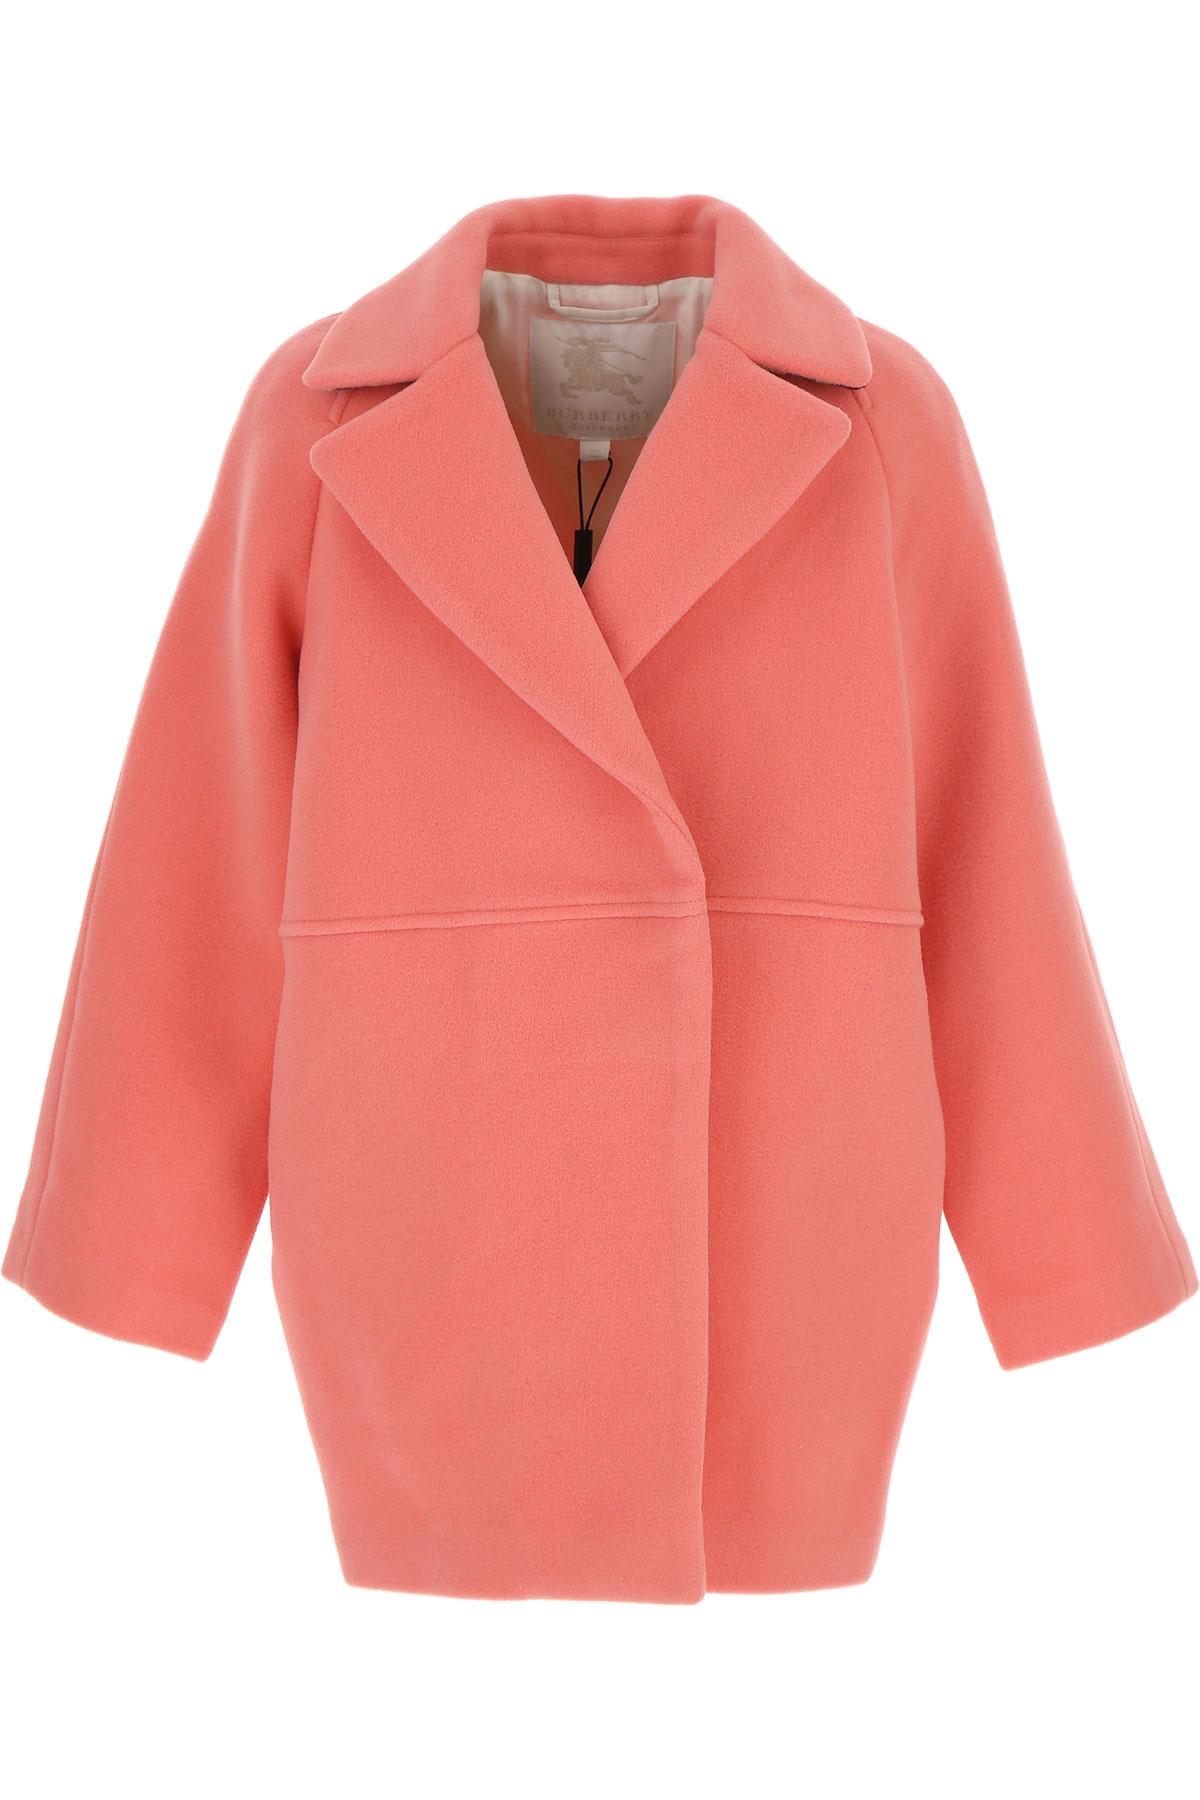 Image of Burberry {DESIGNER} Kids Coat for Girls, Bright Pink, Wool, 2017, 10Y 14Y